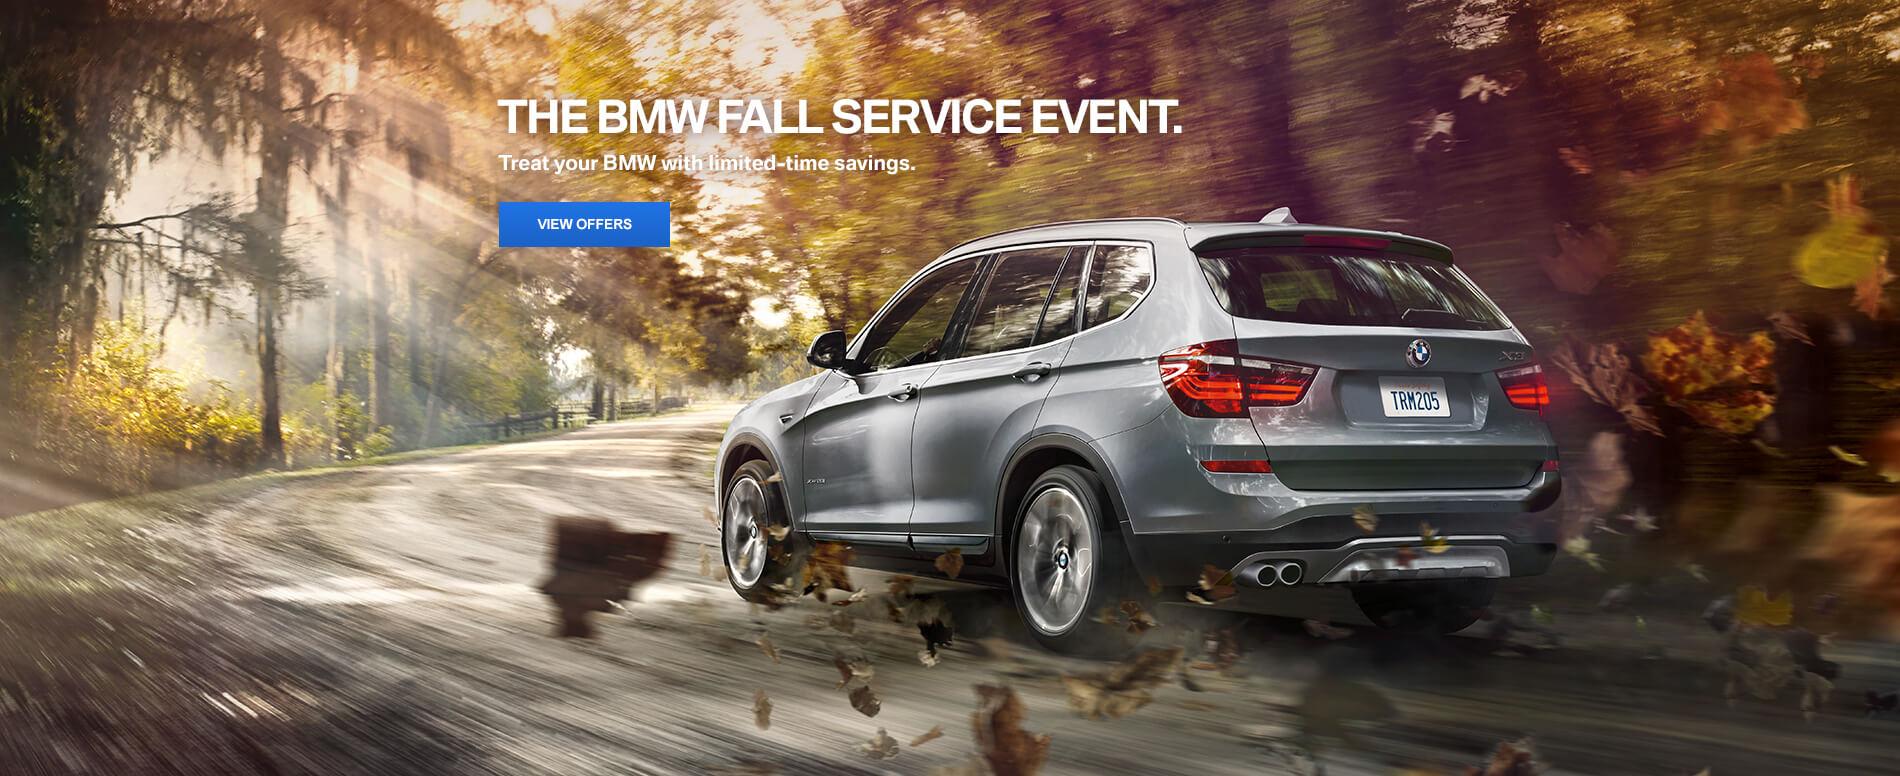 BMW Fall Service Event